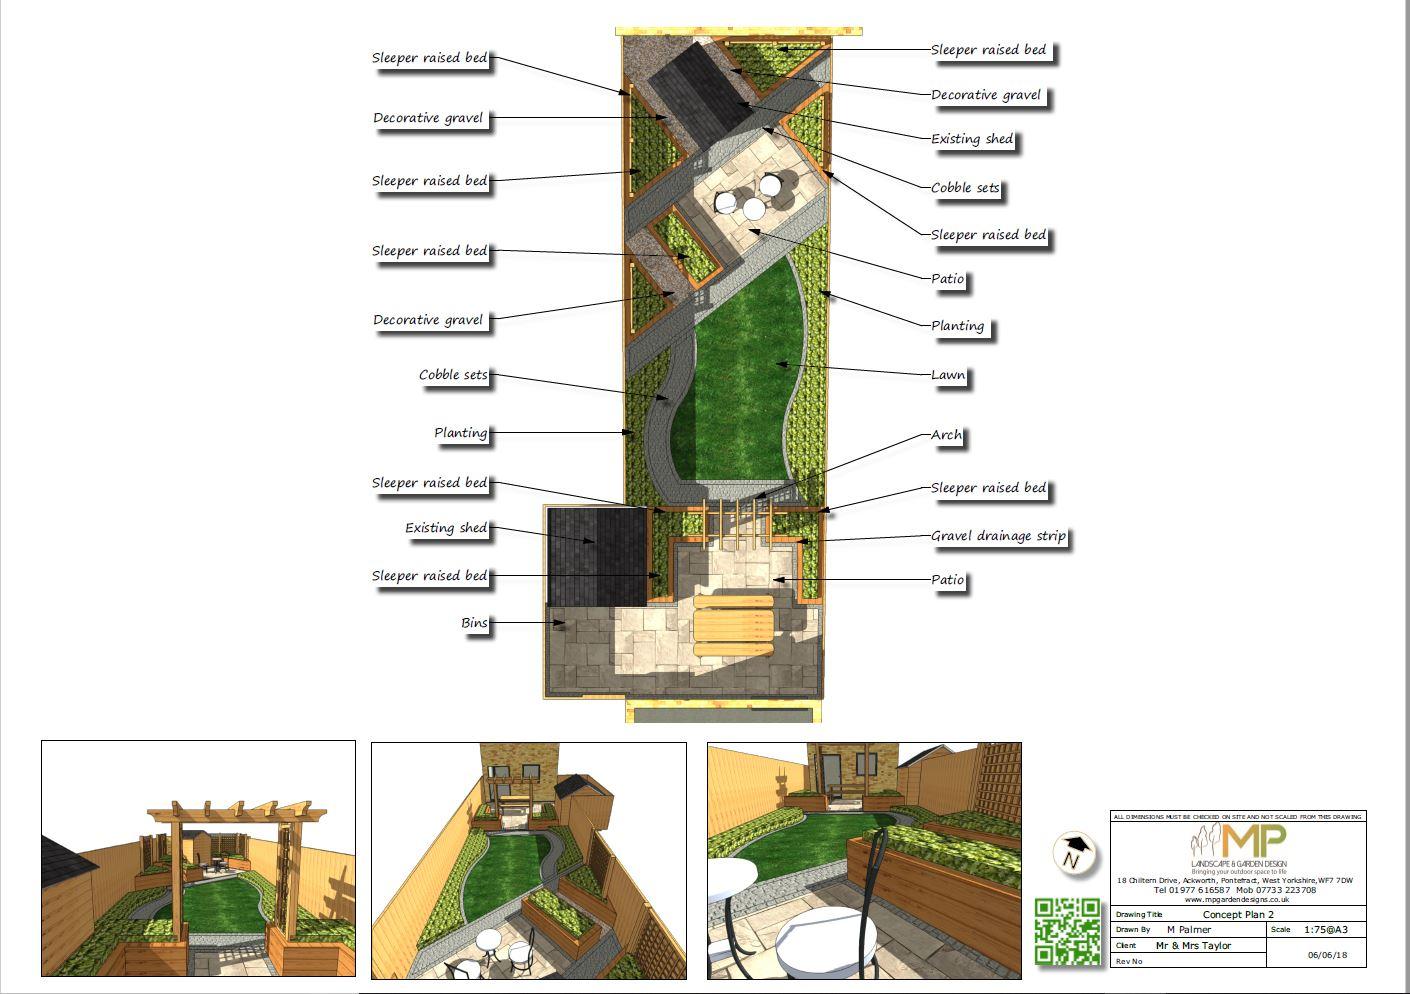 Concept plan-2 for a rear garden in Fitzwilliam.